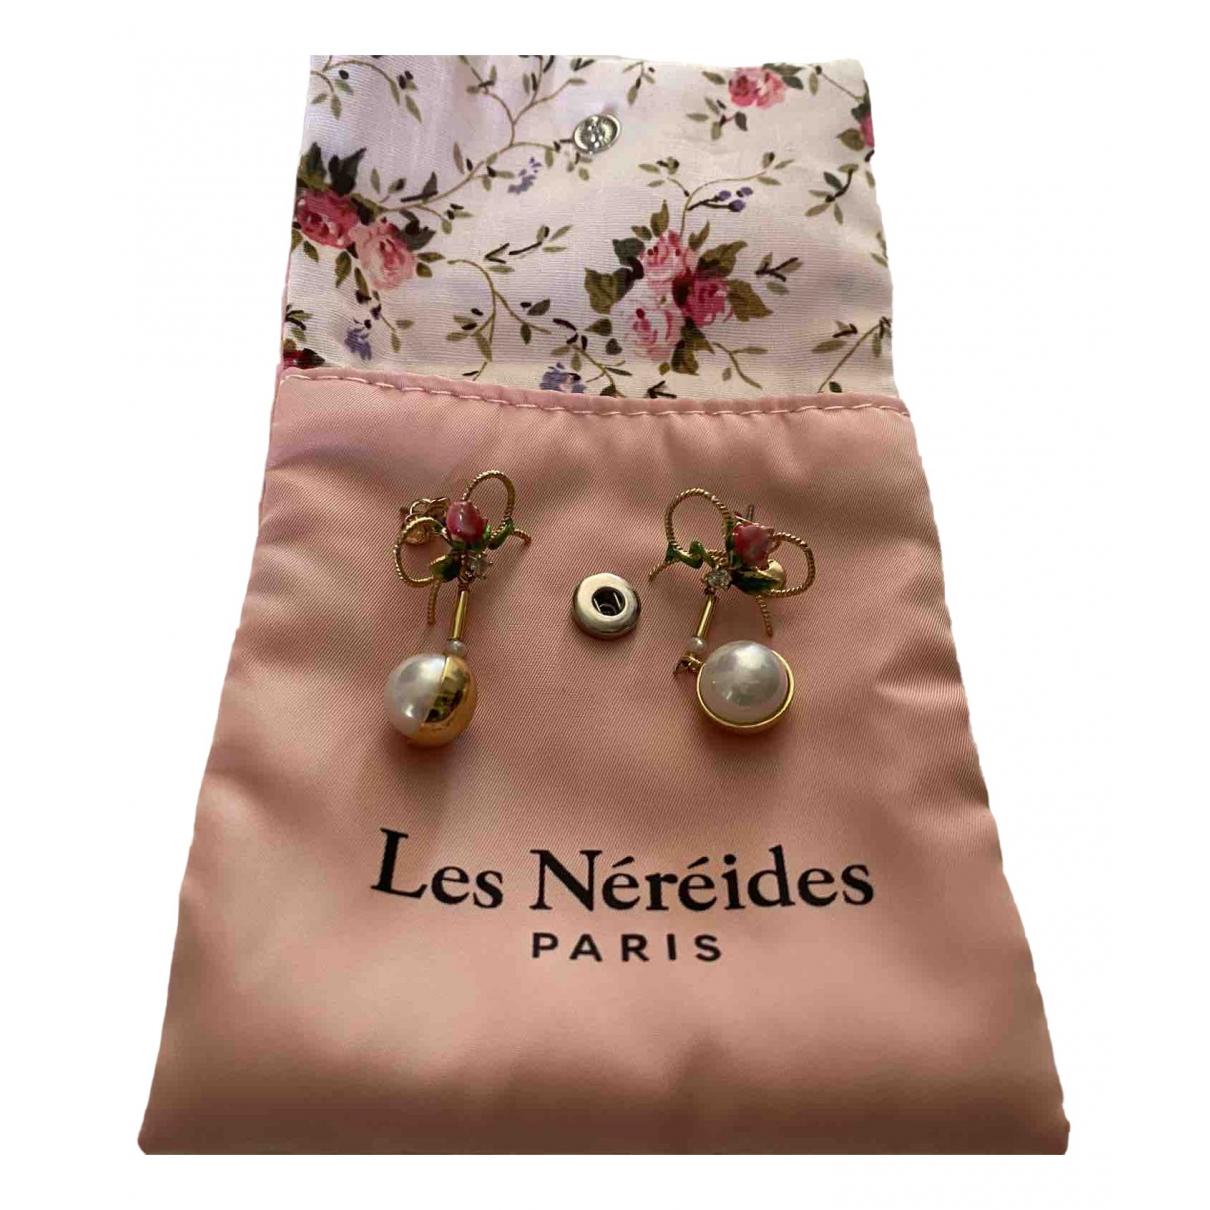 Les Nereides \N OhrRing in  Gelb Metall